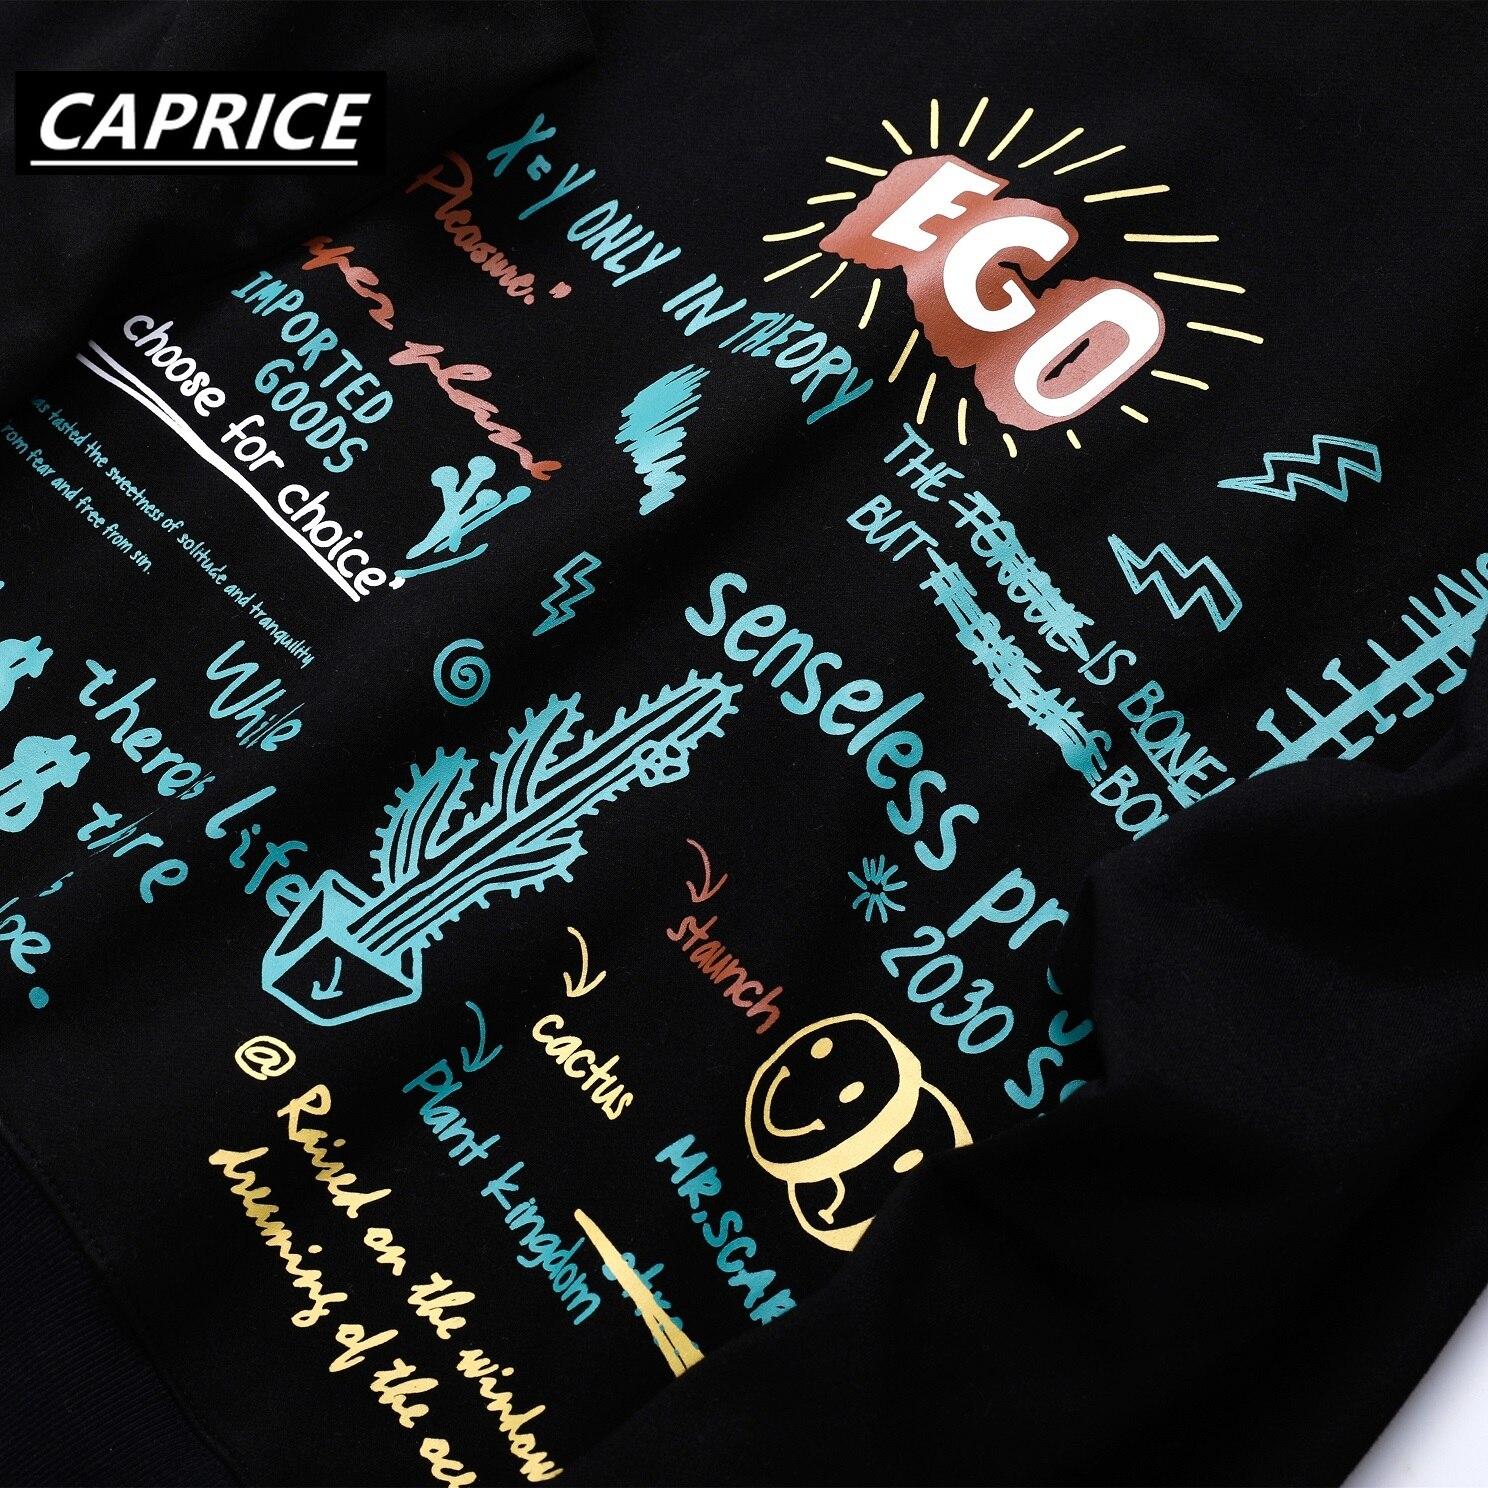 2019 Harajuku Graffiti Hoodie Sweatshirt Men Hip Hop Hooded Pullover Streetwear Hipster Print Autumn Fashion Loose Hoodie Cotton in Hoodies amp Sweatshirts from Men 39 s Clothing